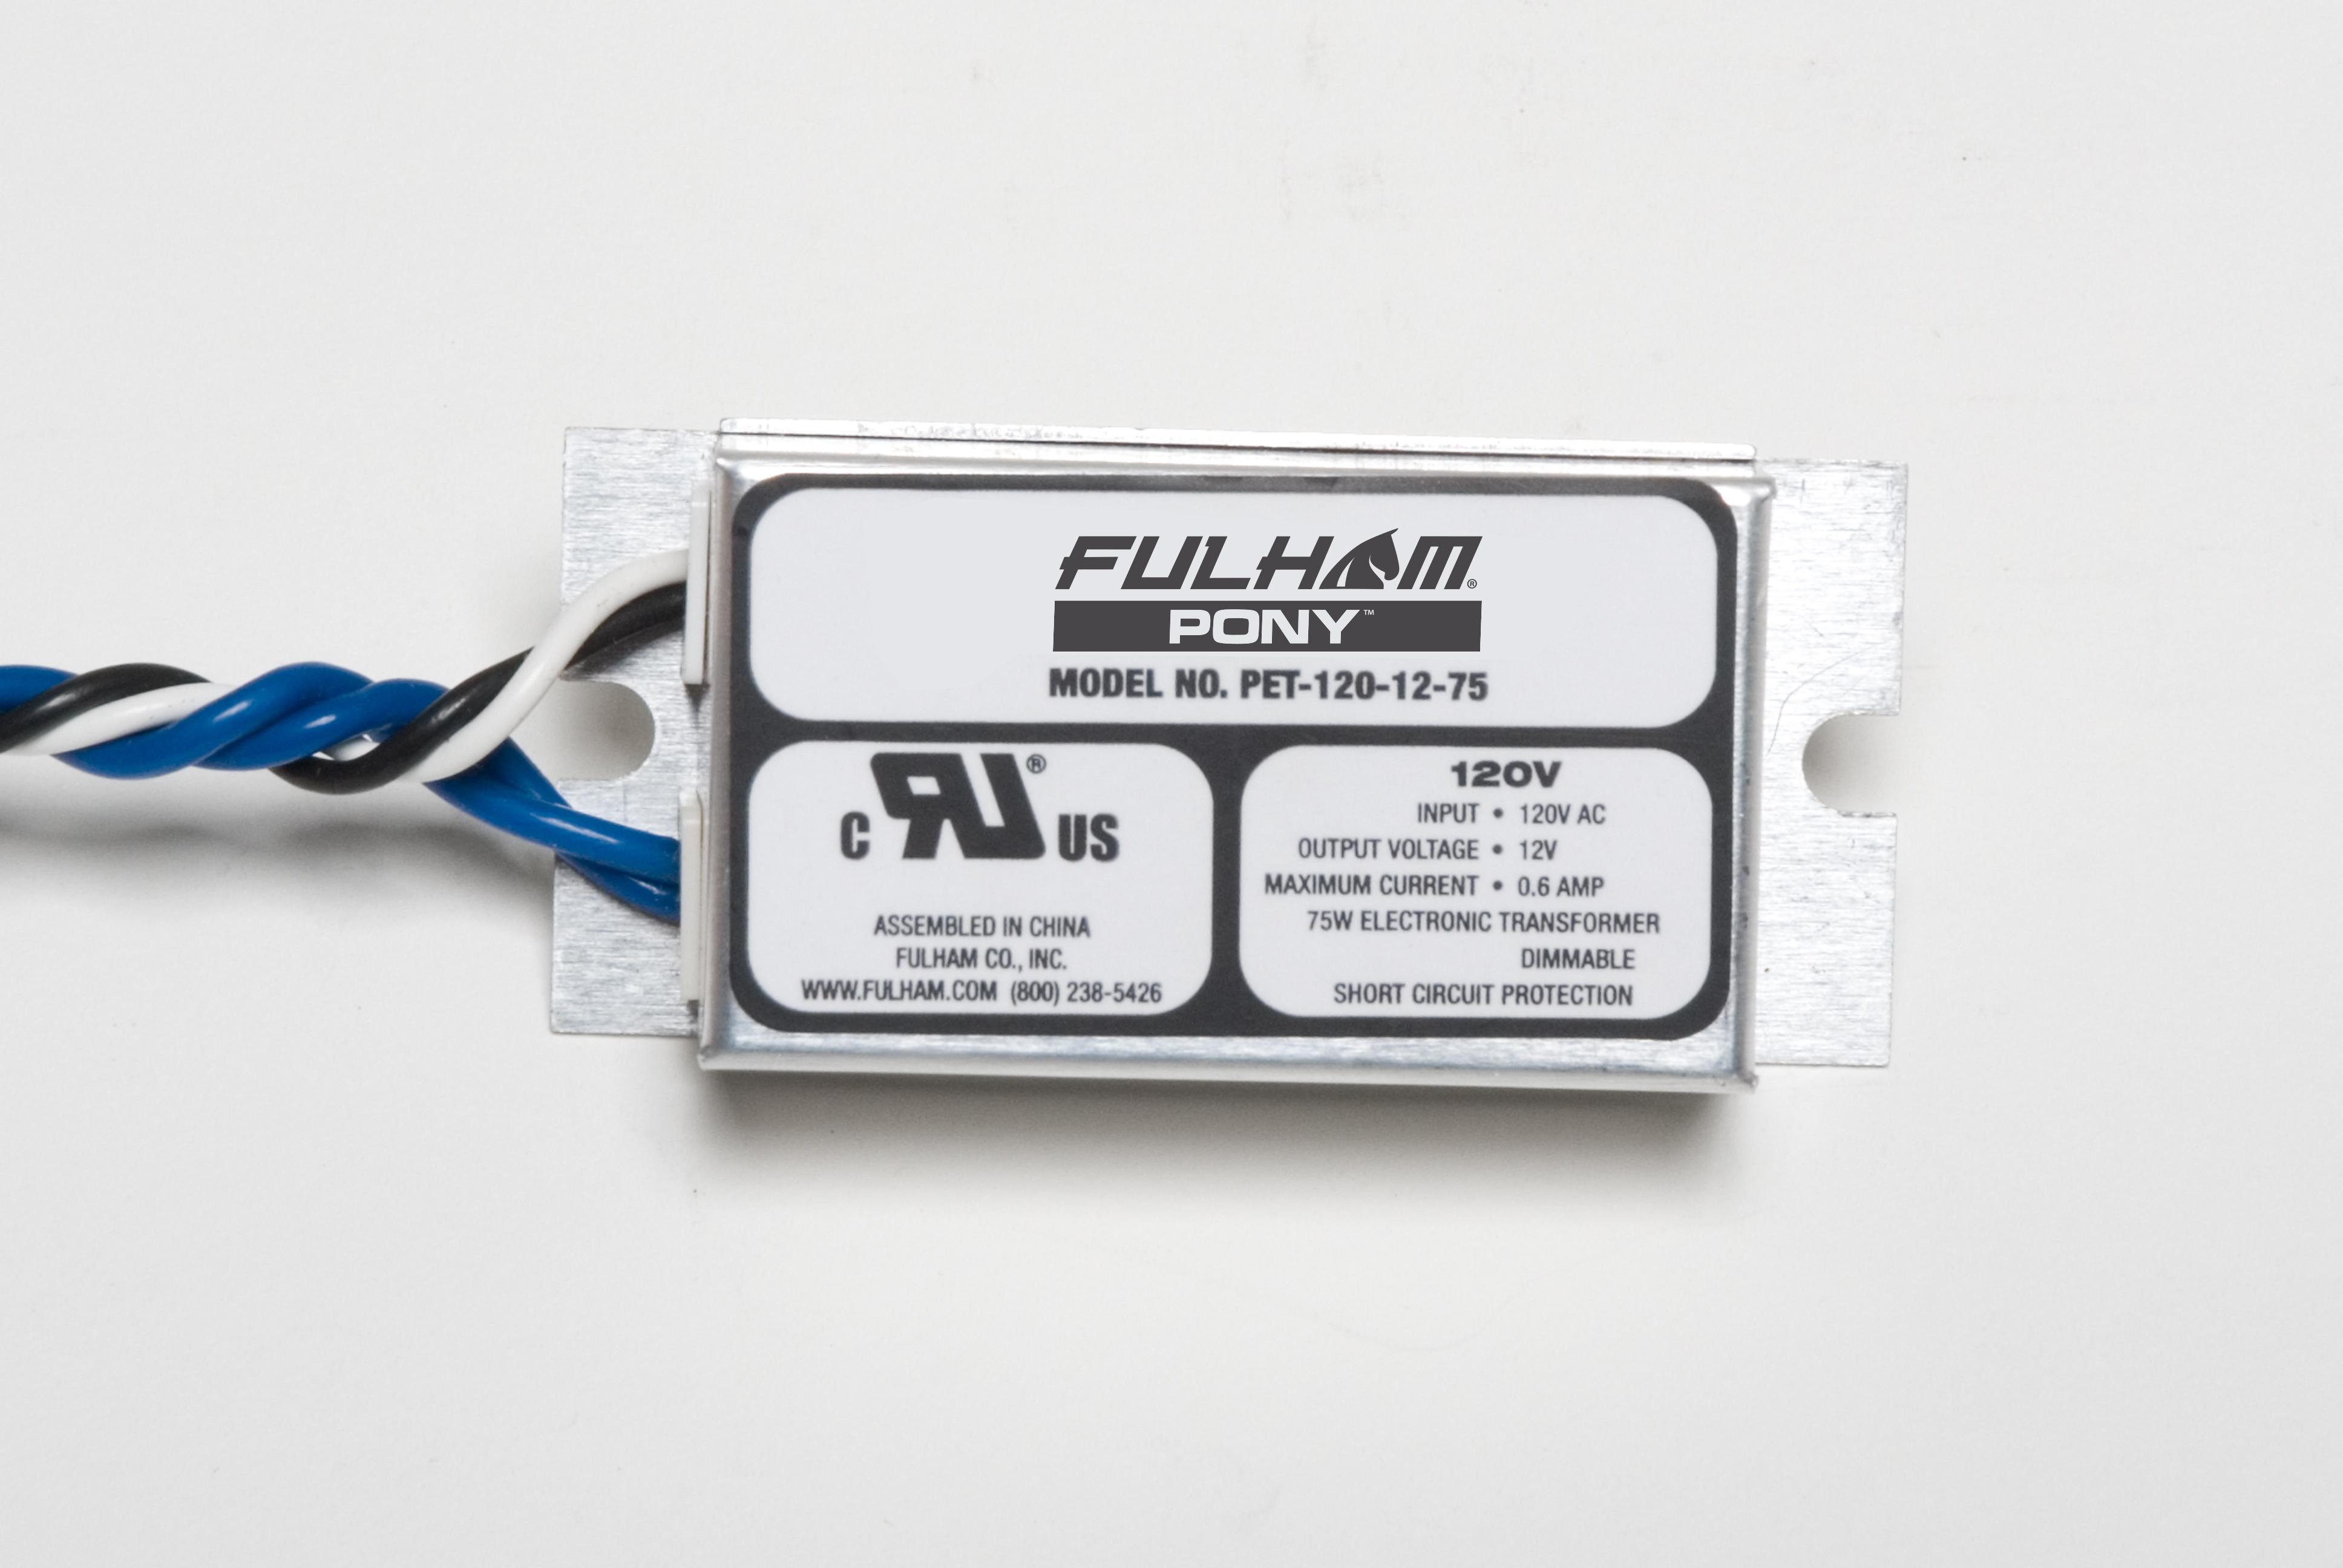 Fulham,PET-120-12-75,PONY Electronic Transformer - Low Voltage Step Down - 120V AC --> 12V DC - 75W